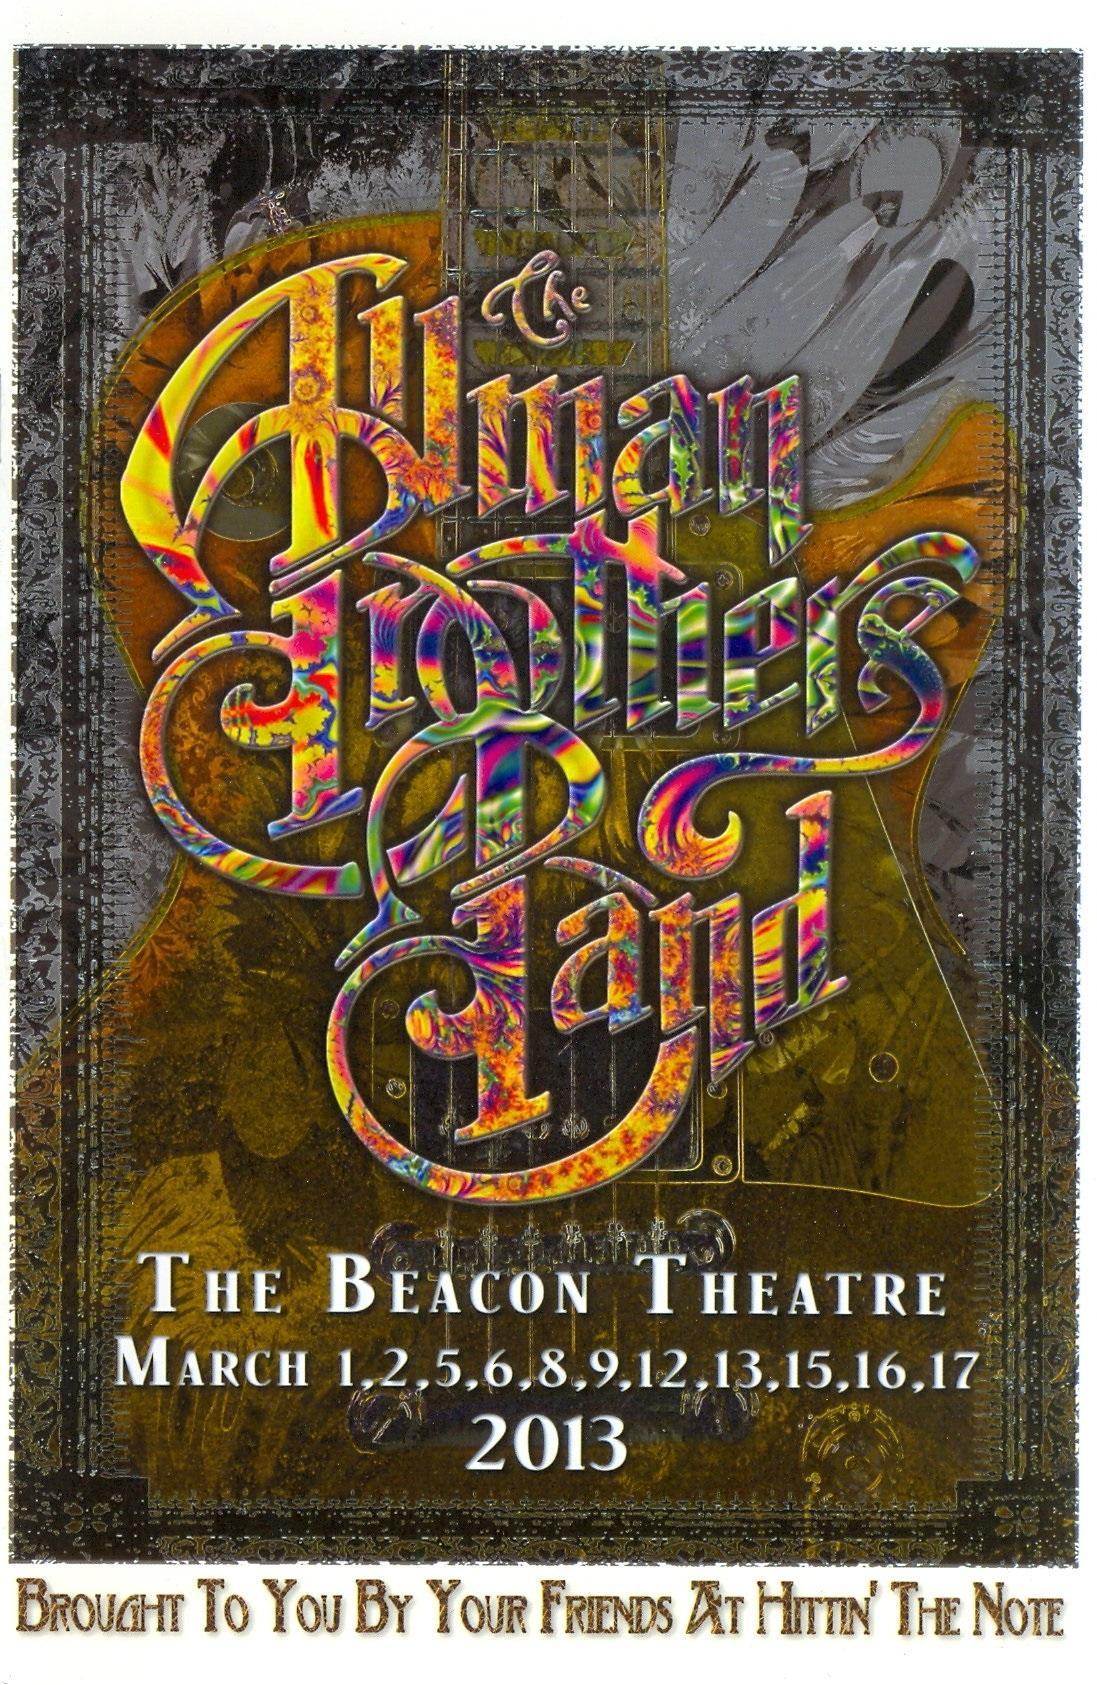 Gov/'t Mule 2012 Beacon Theatre Crossbody Bag